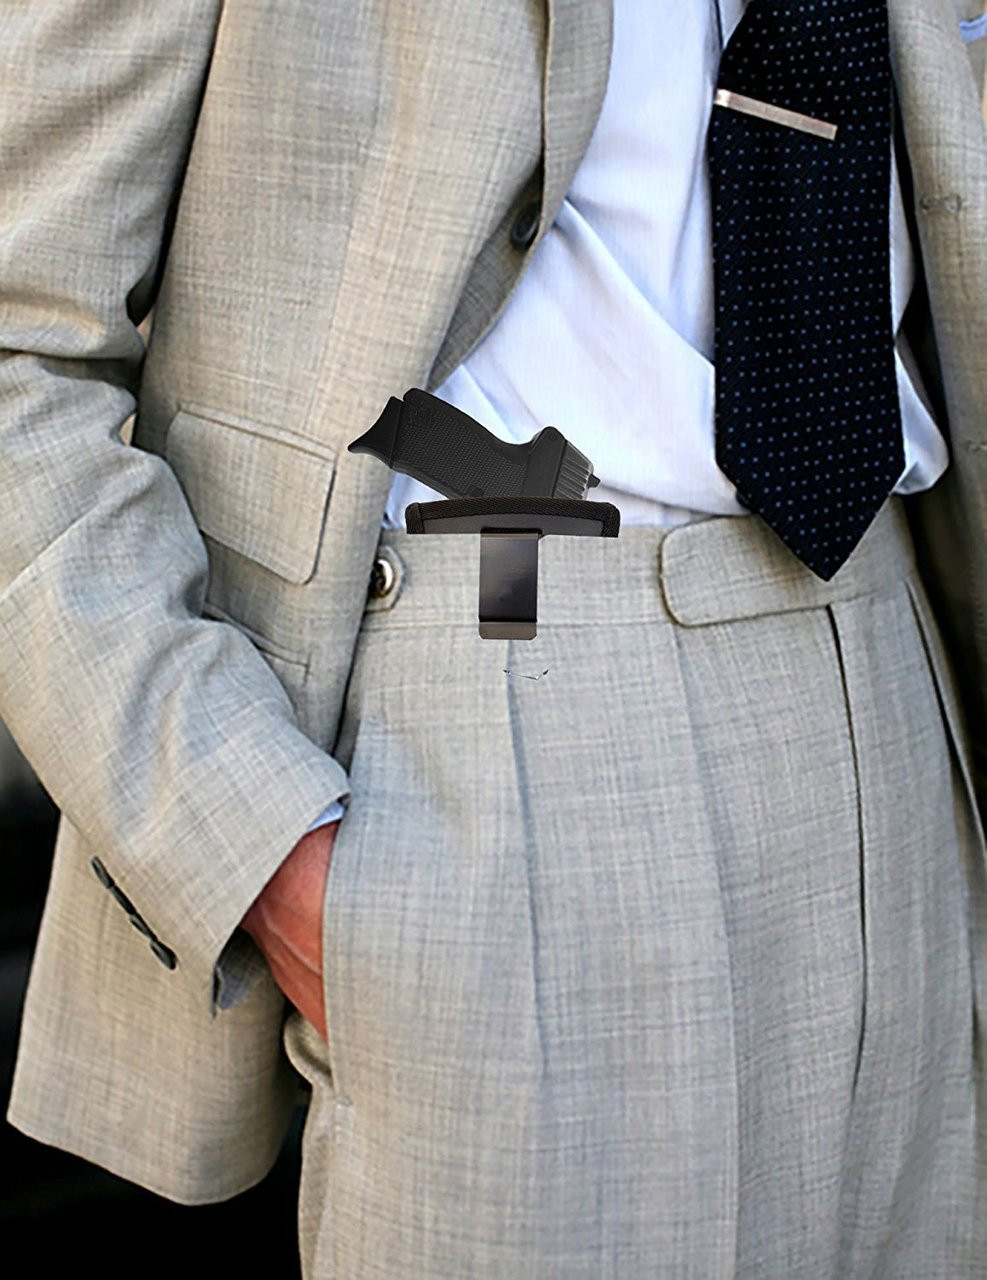 Garrison Grip Leather Inside and Outside Waistband Easy Slide Holster Fits Kel-Tec PF11 (SLH) Black